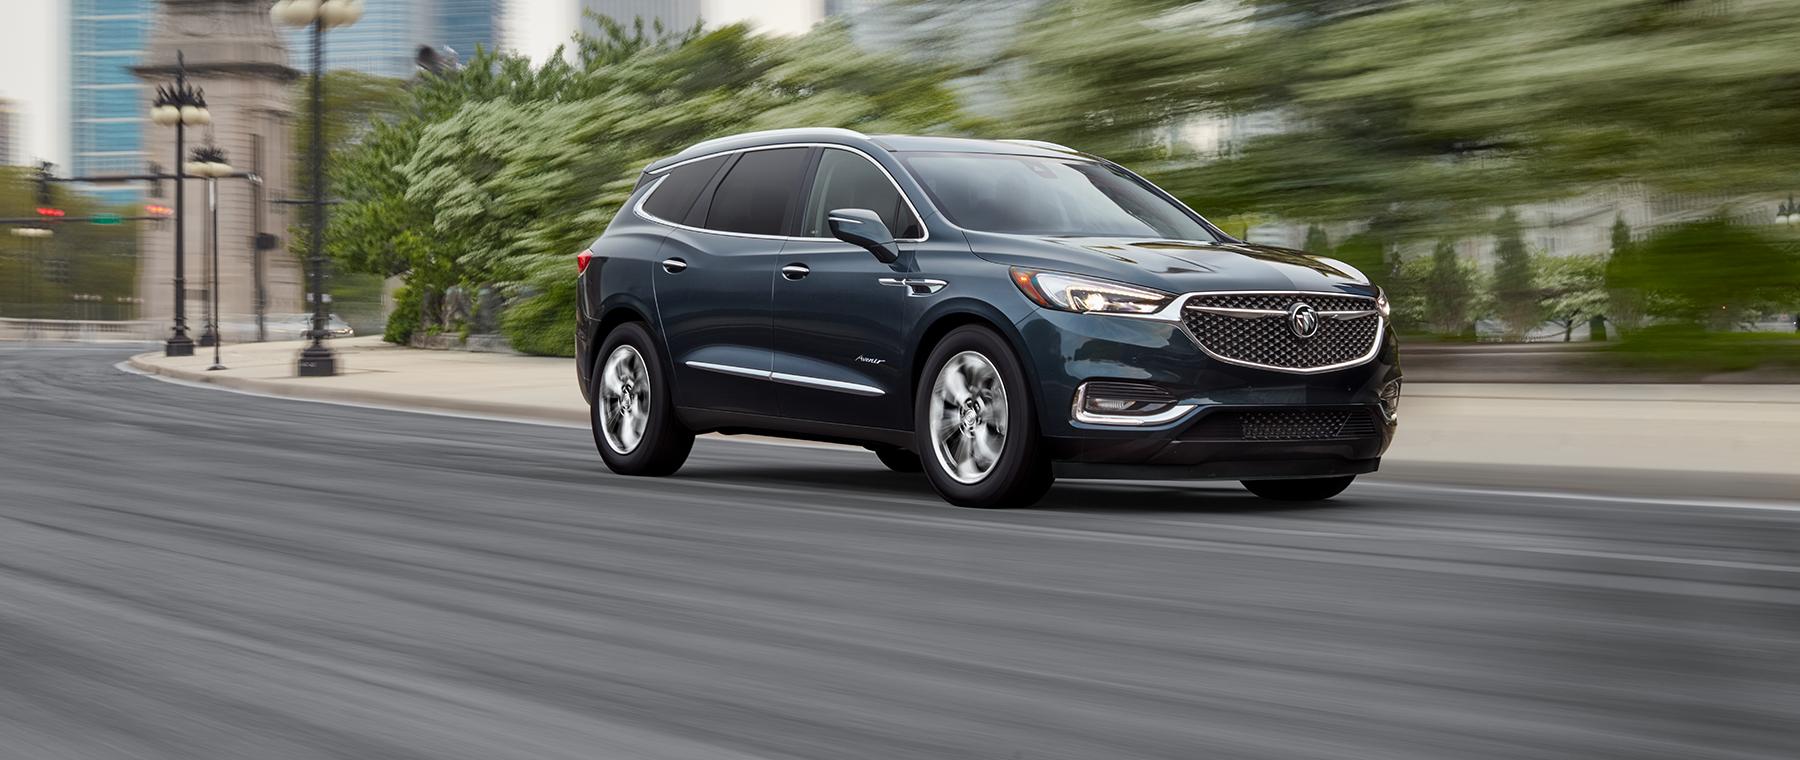 Faulkner Buick Gmc >> Capitol Buick Gmc Upcoming New Car Release 2020